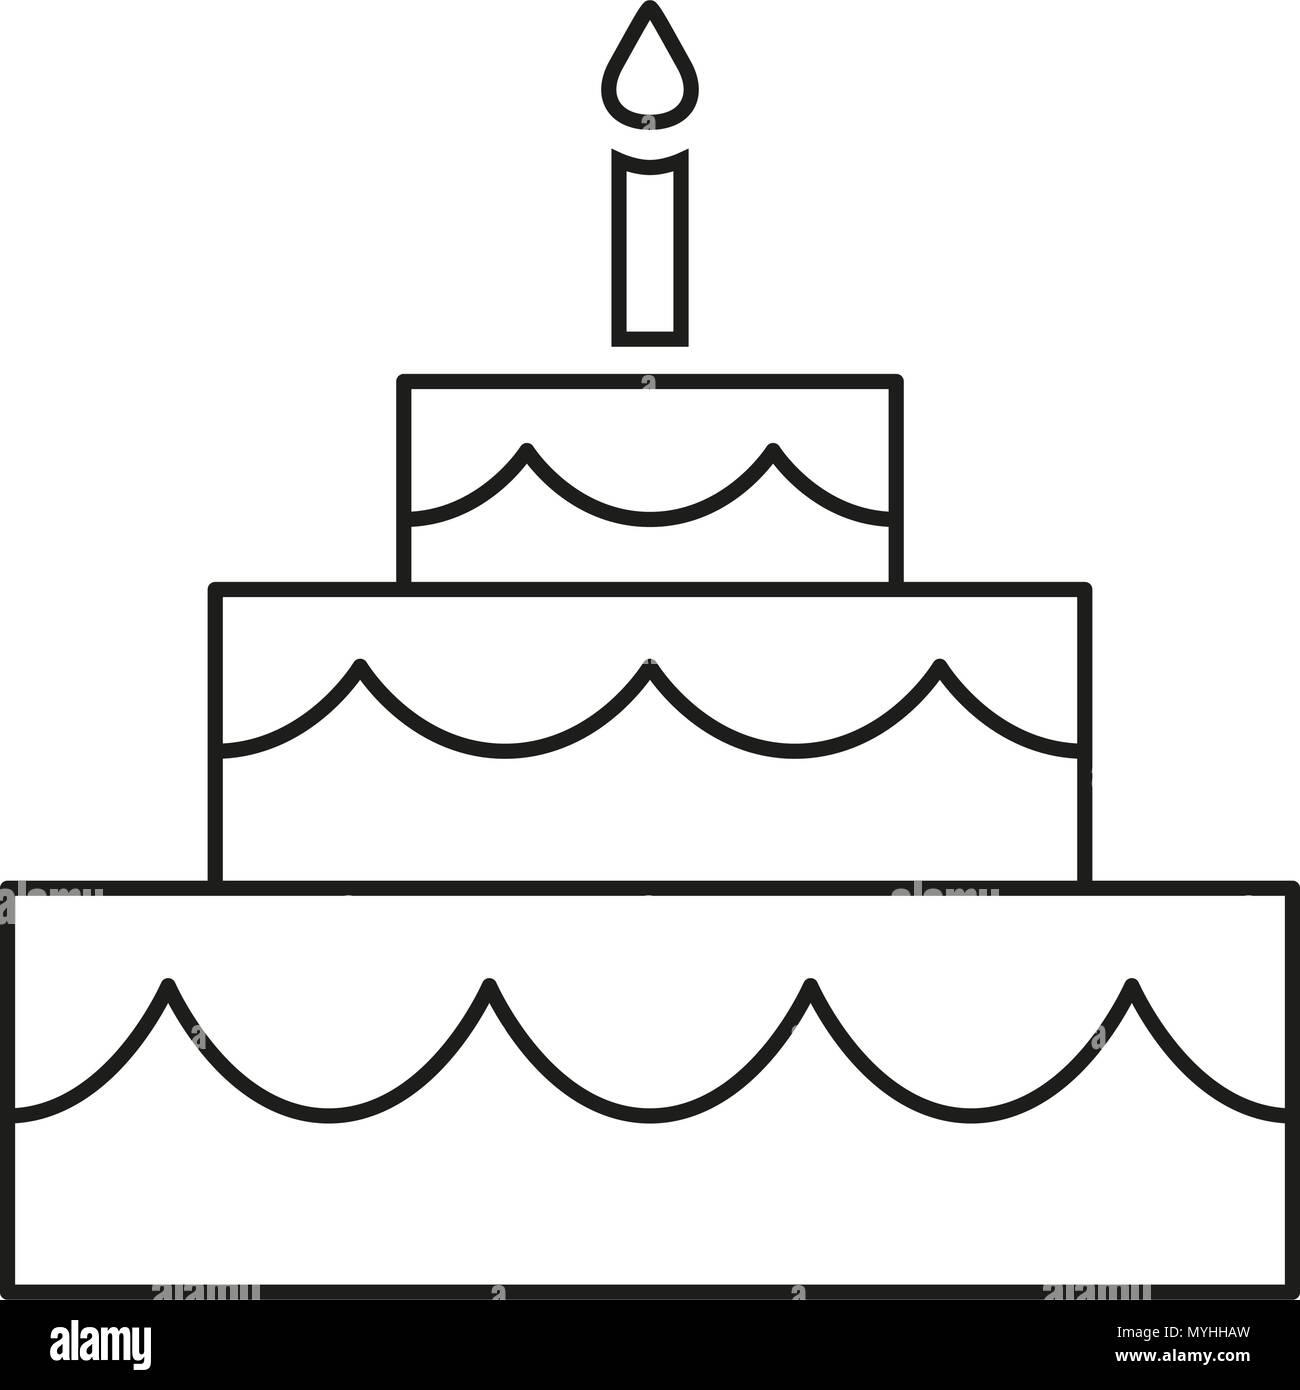 Wedding Cake Dessert Outline Stock Photos Wedding Cake Dessert